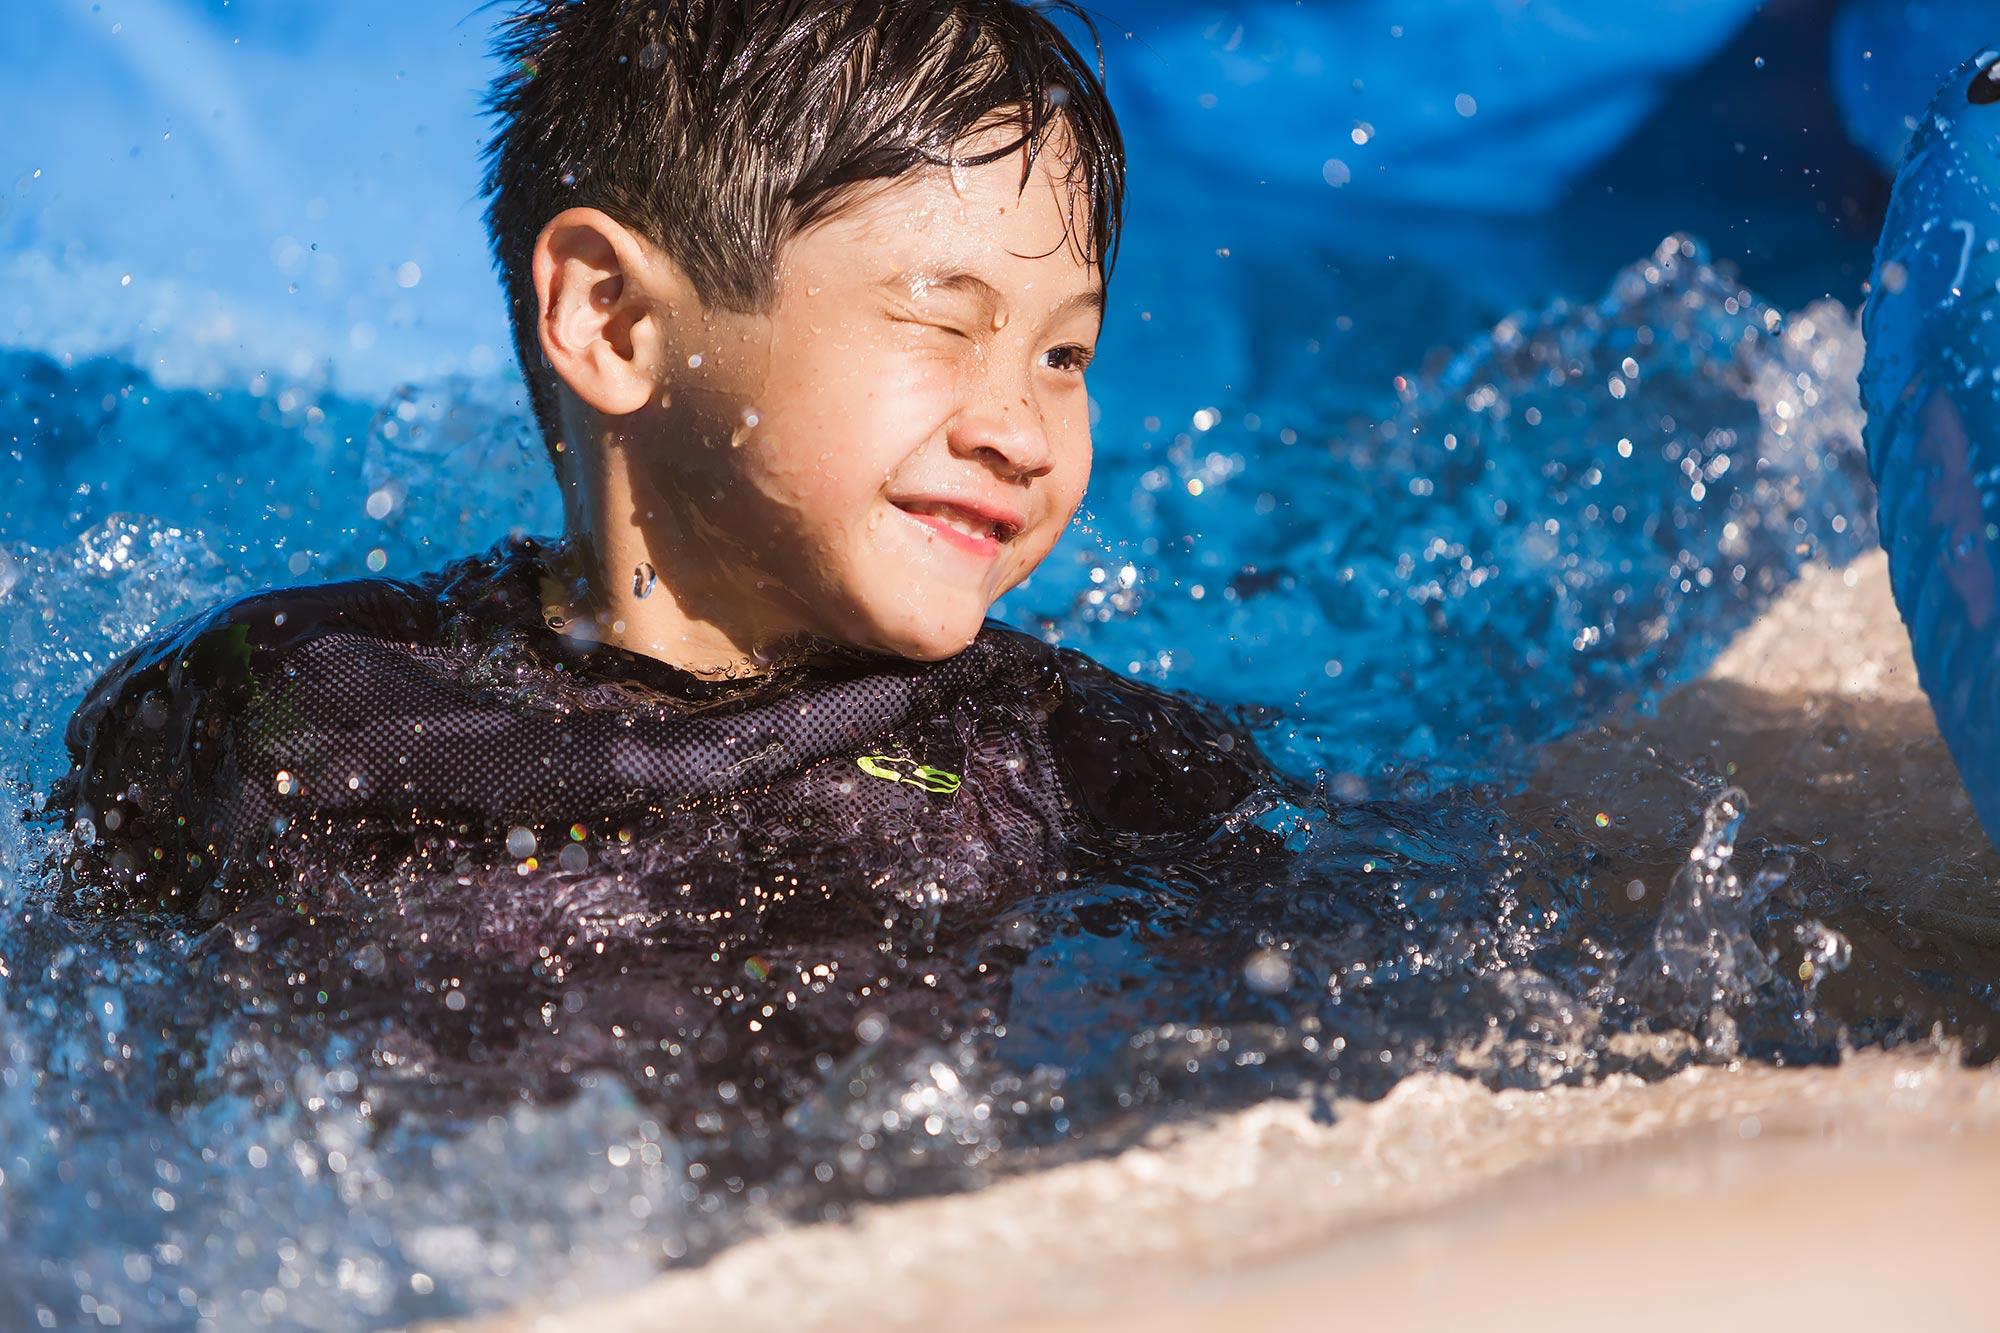 Boston Children's Birthday Photographer   Stephen Grant Photography